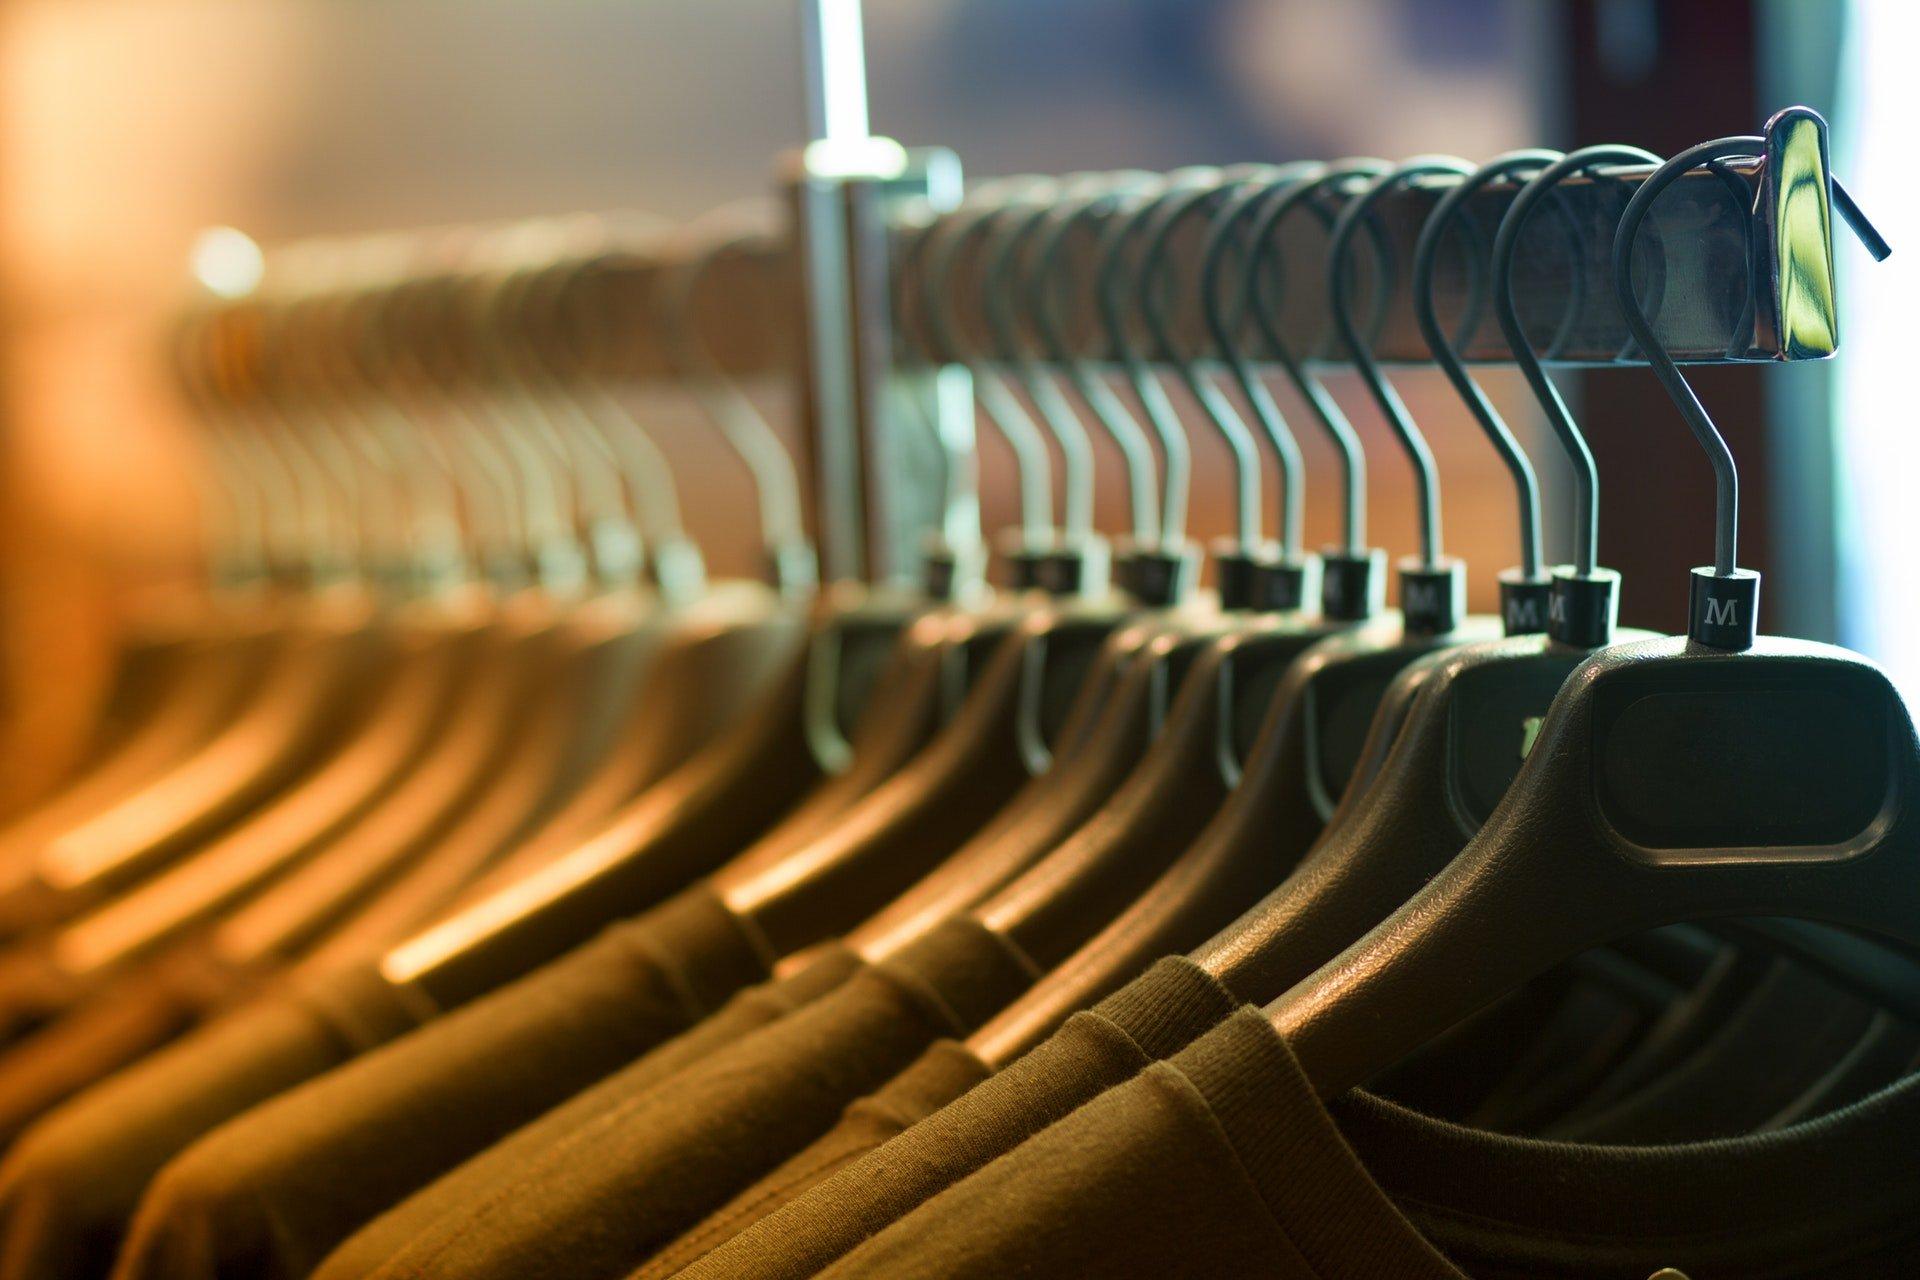 T-shirts hanging in shirt rack